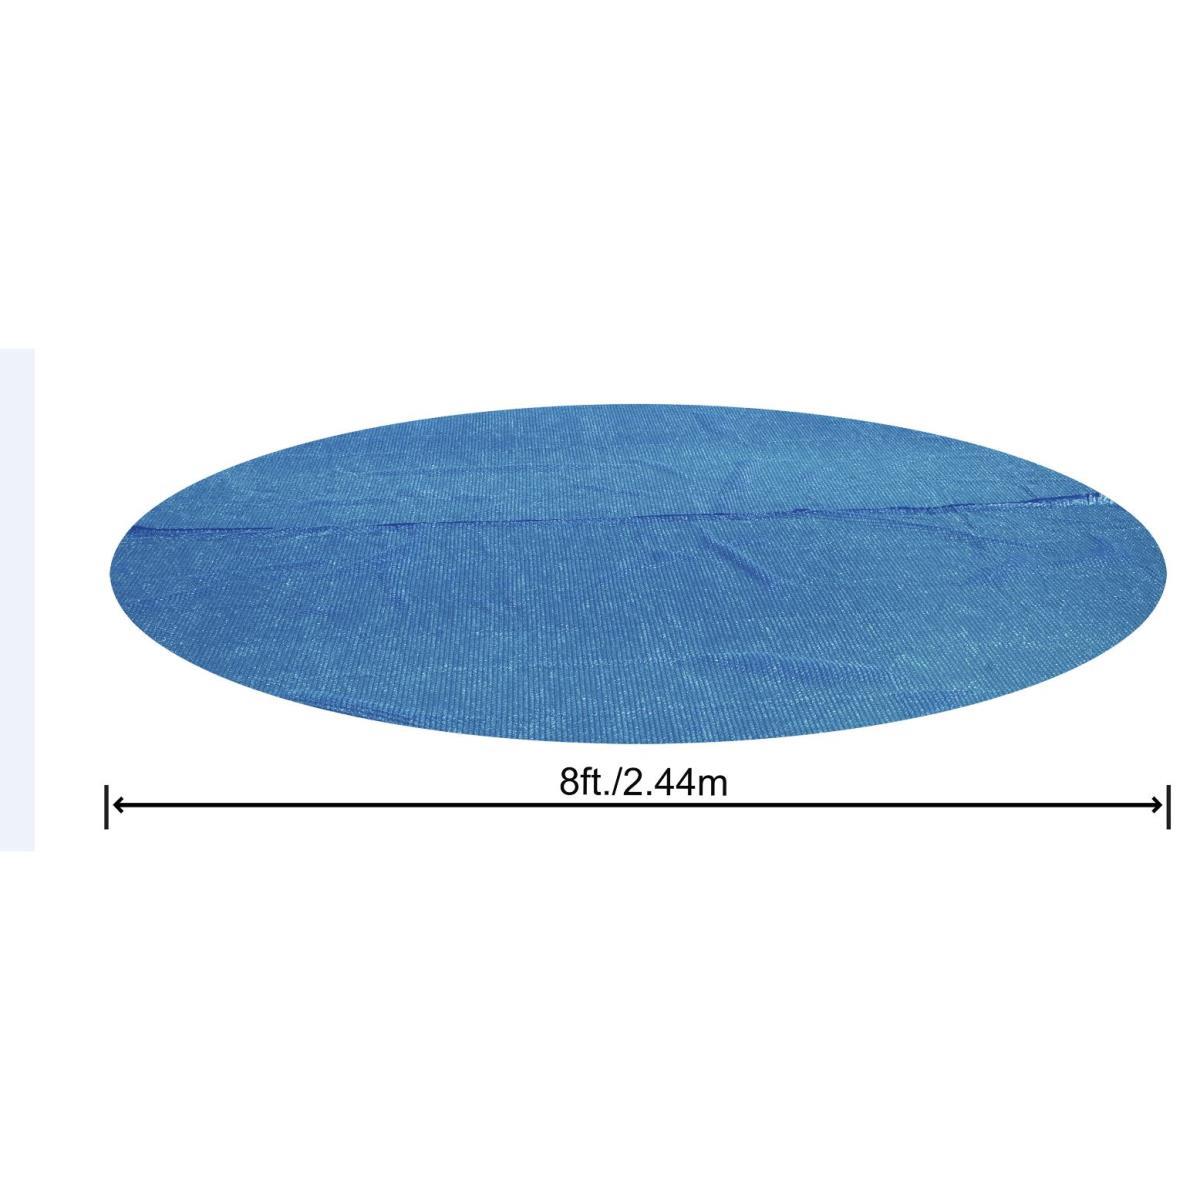 Bestway Flowclear Solarabdeckplane  Ø 210 cm Poolabdeckung Abdeckplane Pool,Bestway,58060, 6942138918328